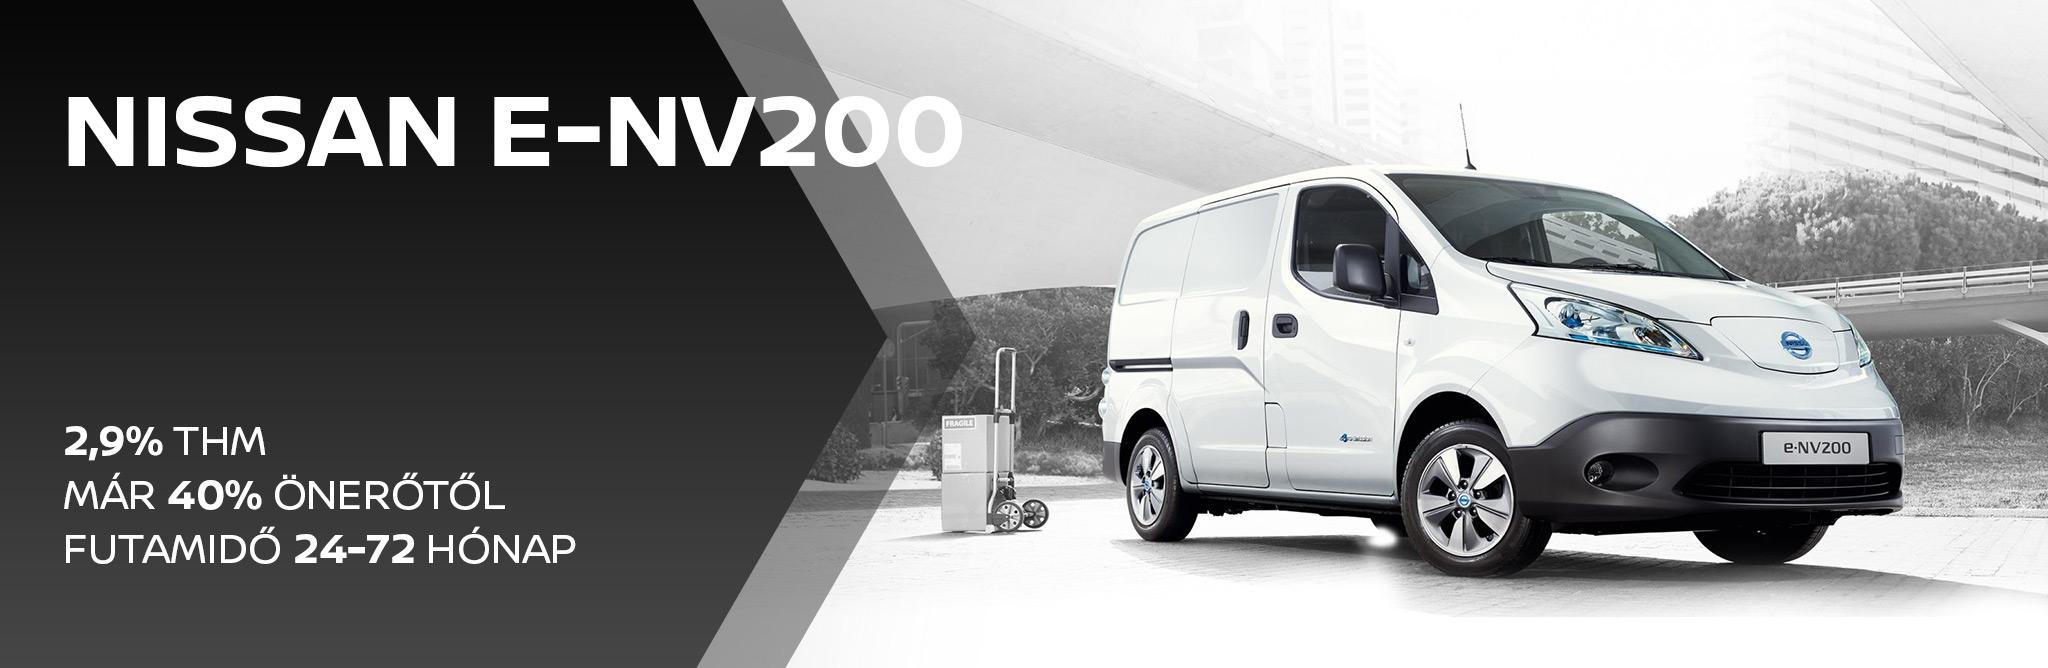 Nissan e-NV200 2,9% THM